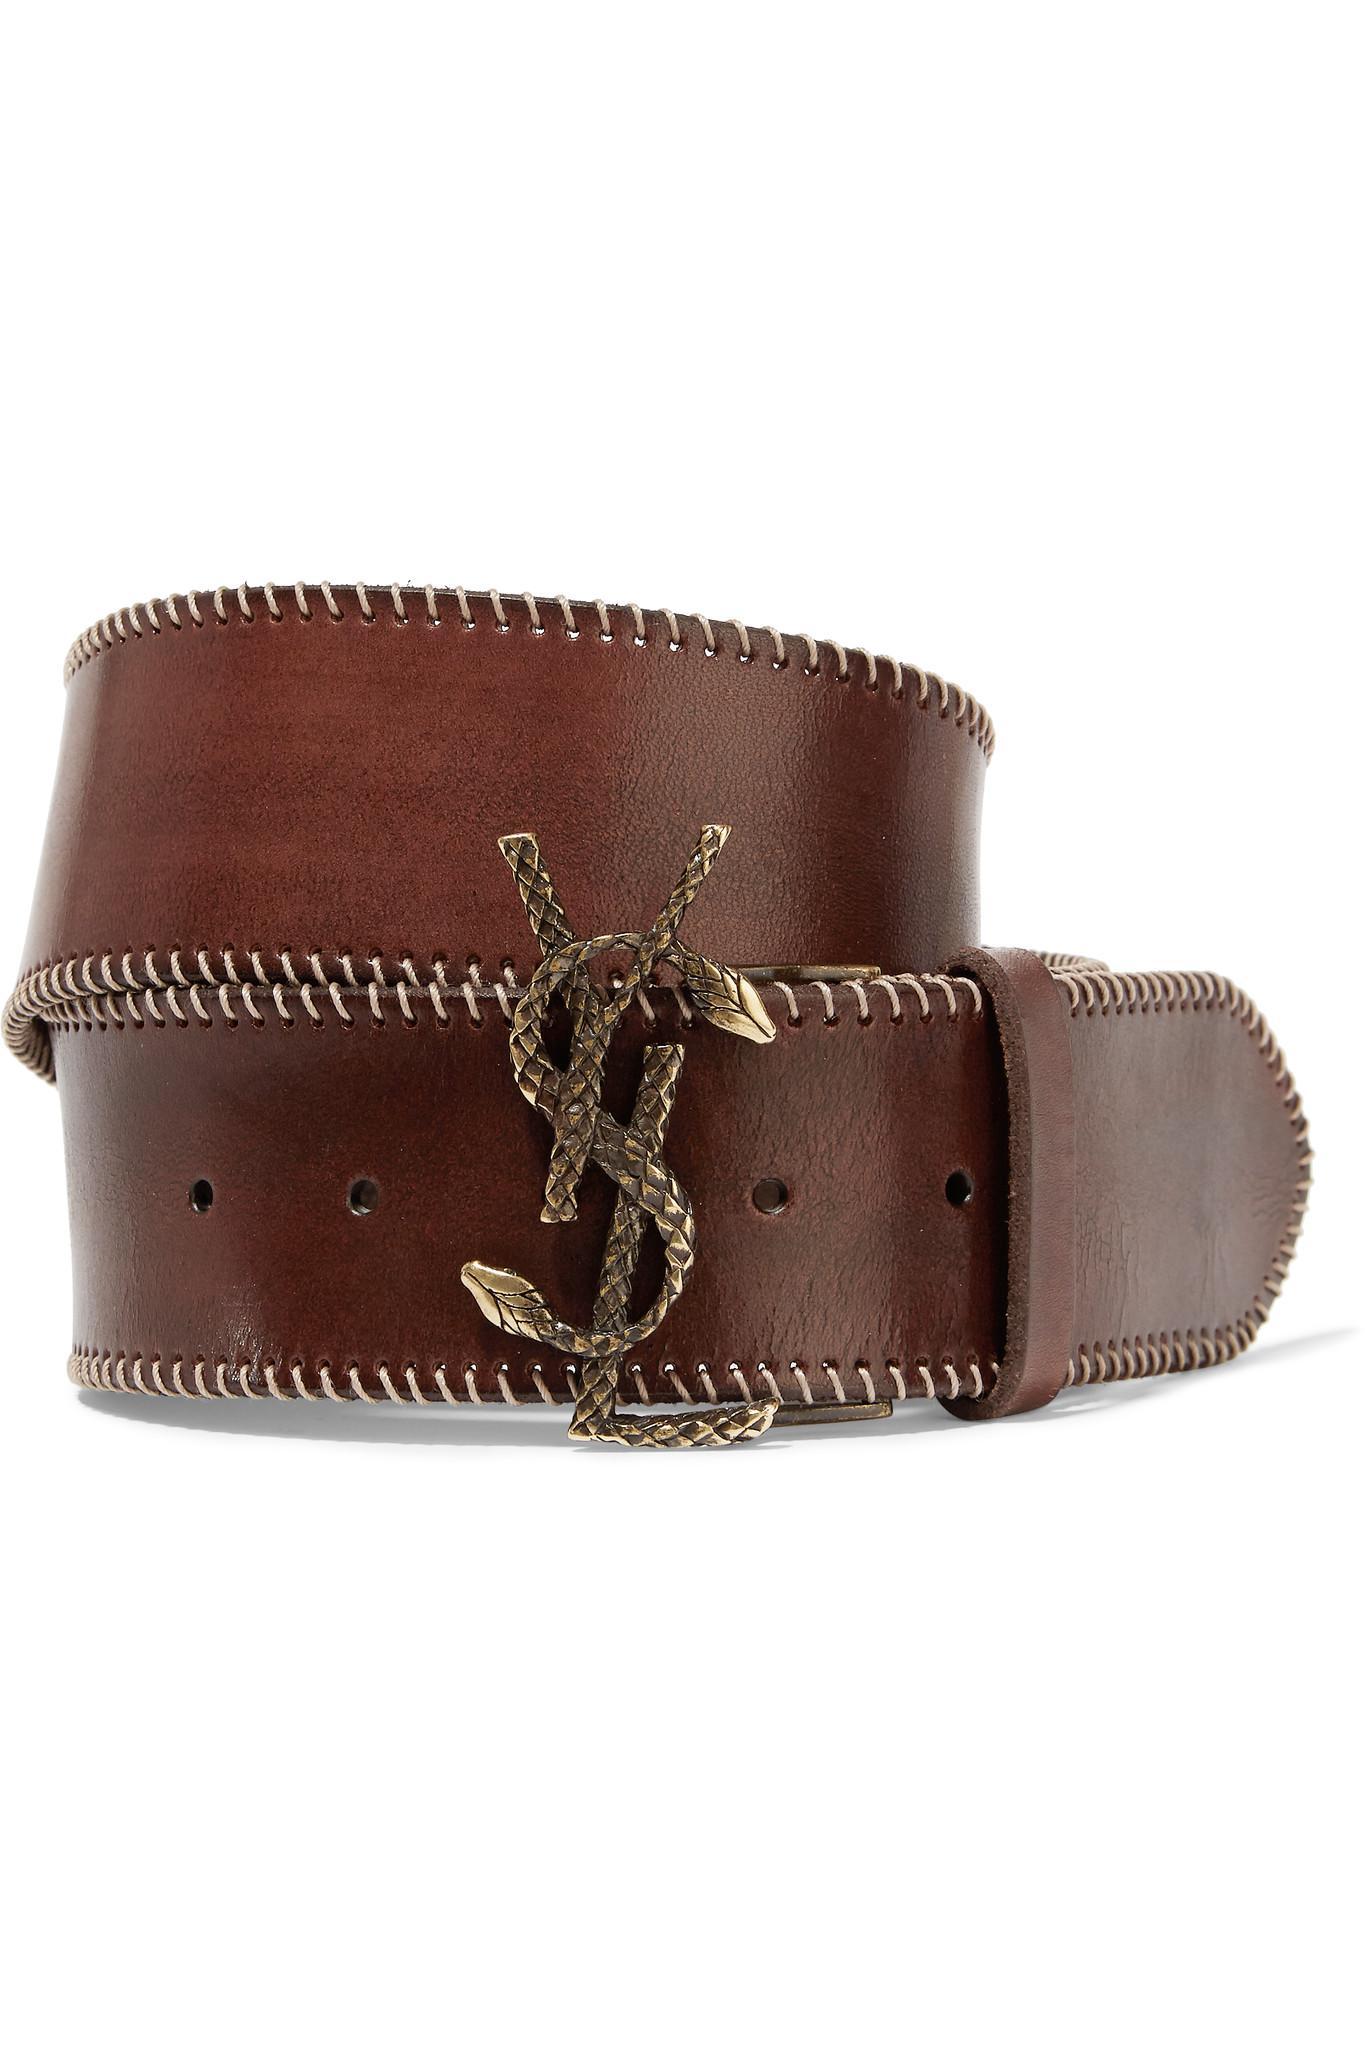 Saint Laurent Leather Belt In Brown Lyst